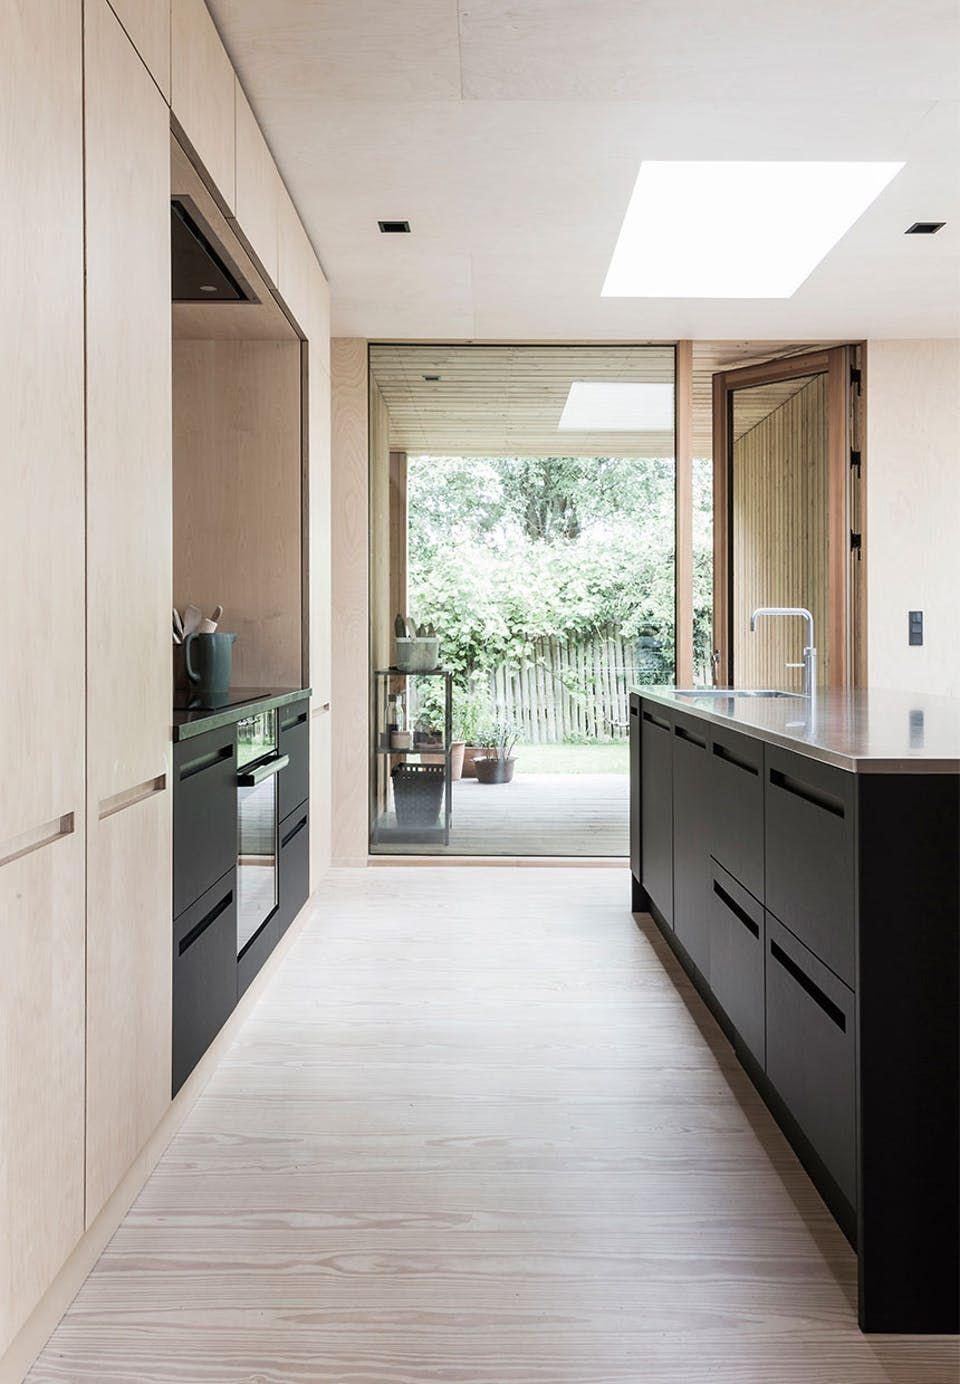 Det unikke kubusformet hus | Skylight, Carpenter and Window